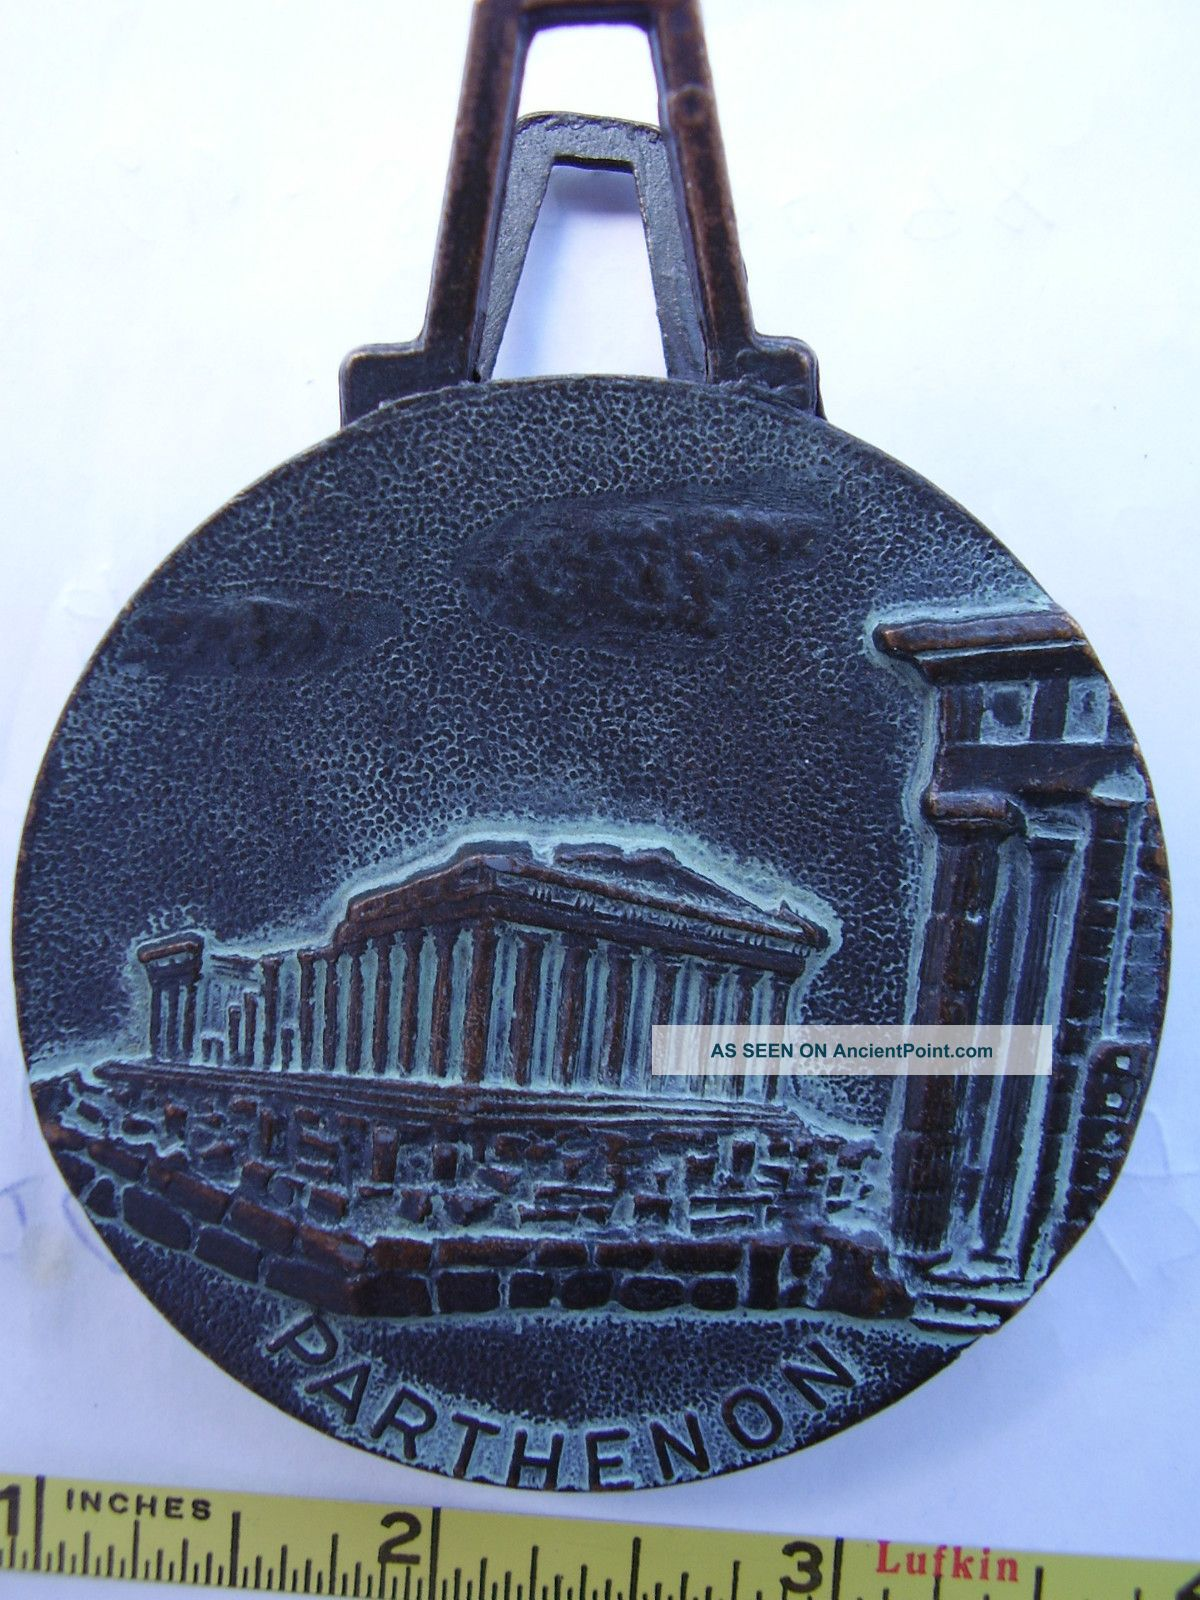 Antique Bronze Letter Paper Holder,  Paper Clip,  Aoe,  Parthenon,  Makers Mark Metalware photo